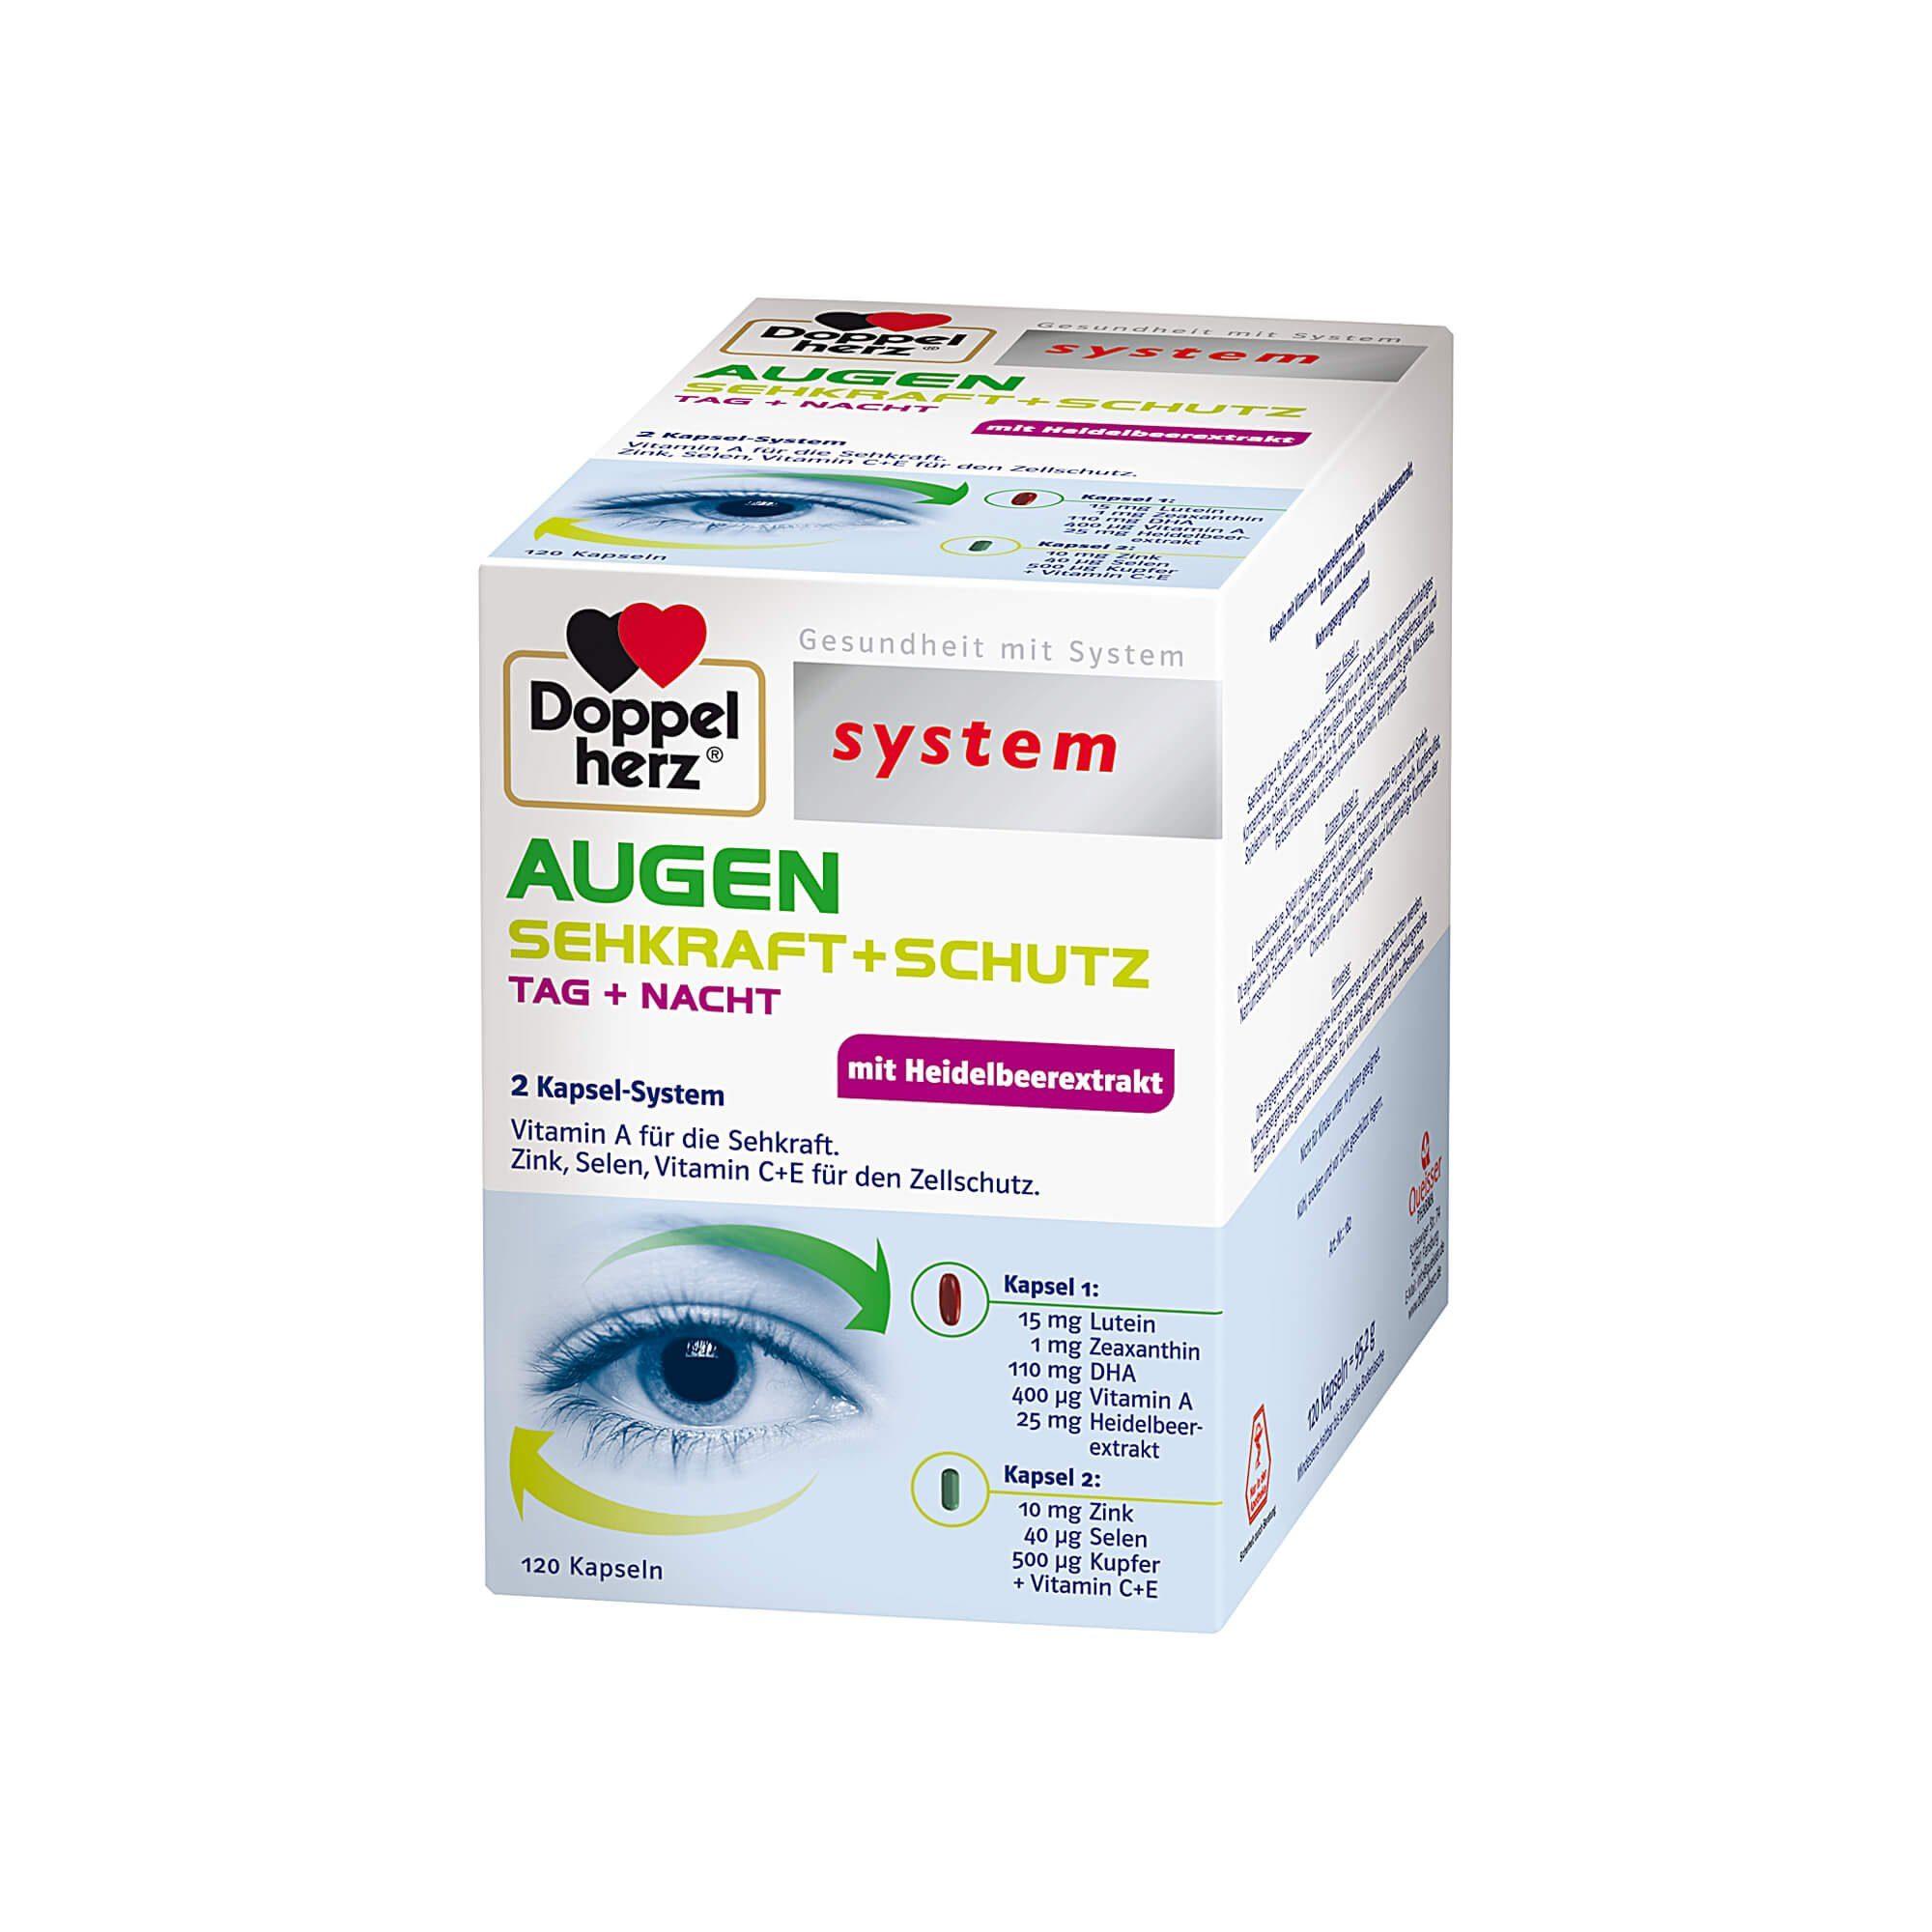 Doppelherz Augen system, 120 St